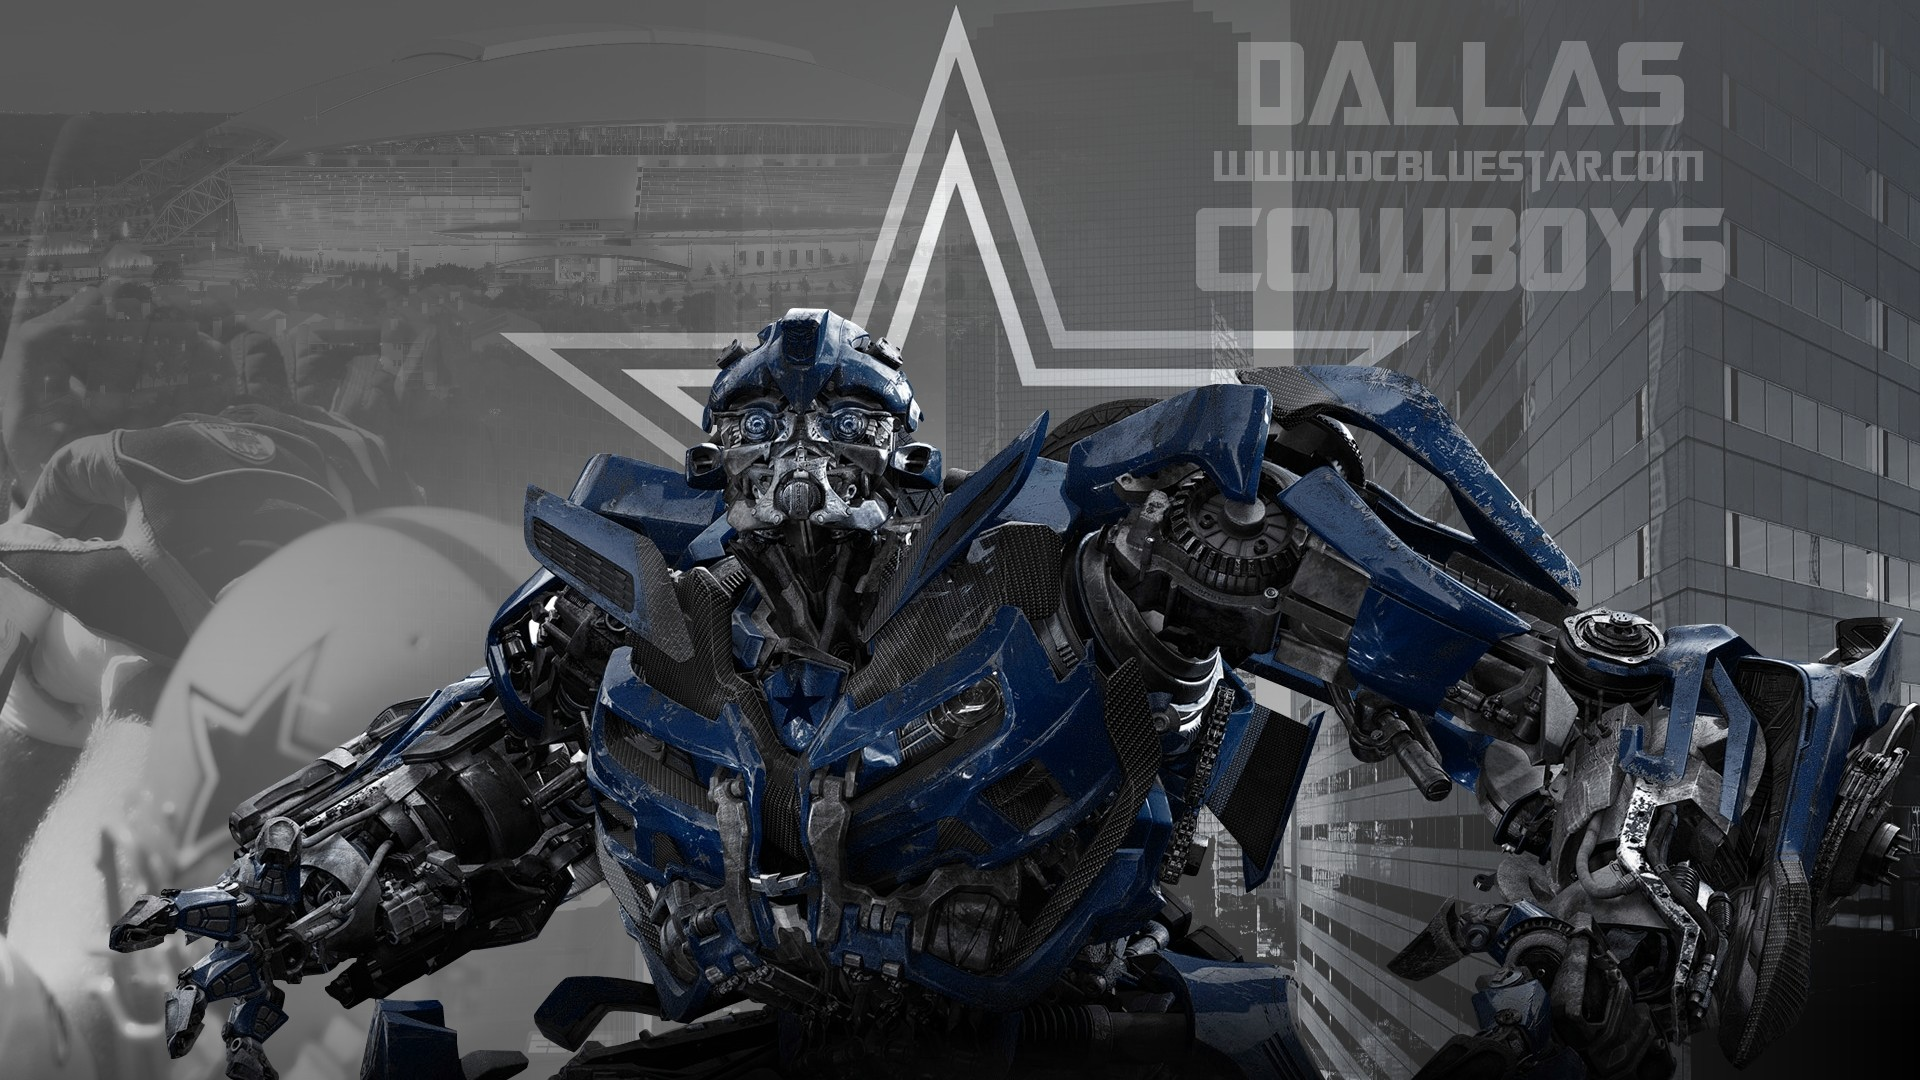 Dallas Cowboys Wallpaper Schedule4   Data Src - Dallas Cowboys Wallpaper 2017 - HD Wallpaper